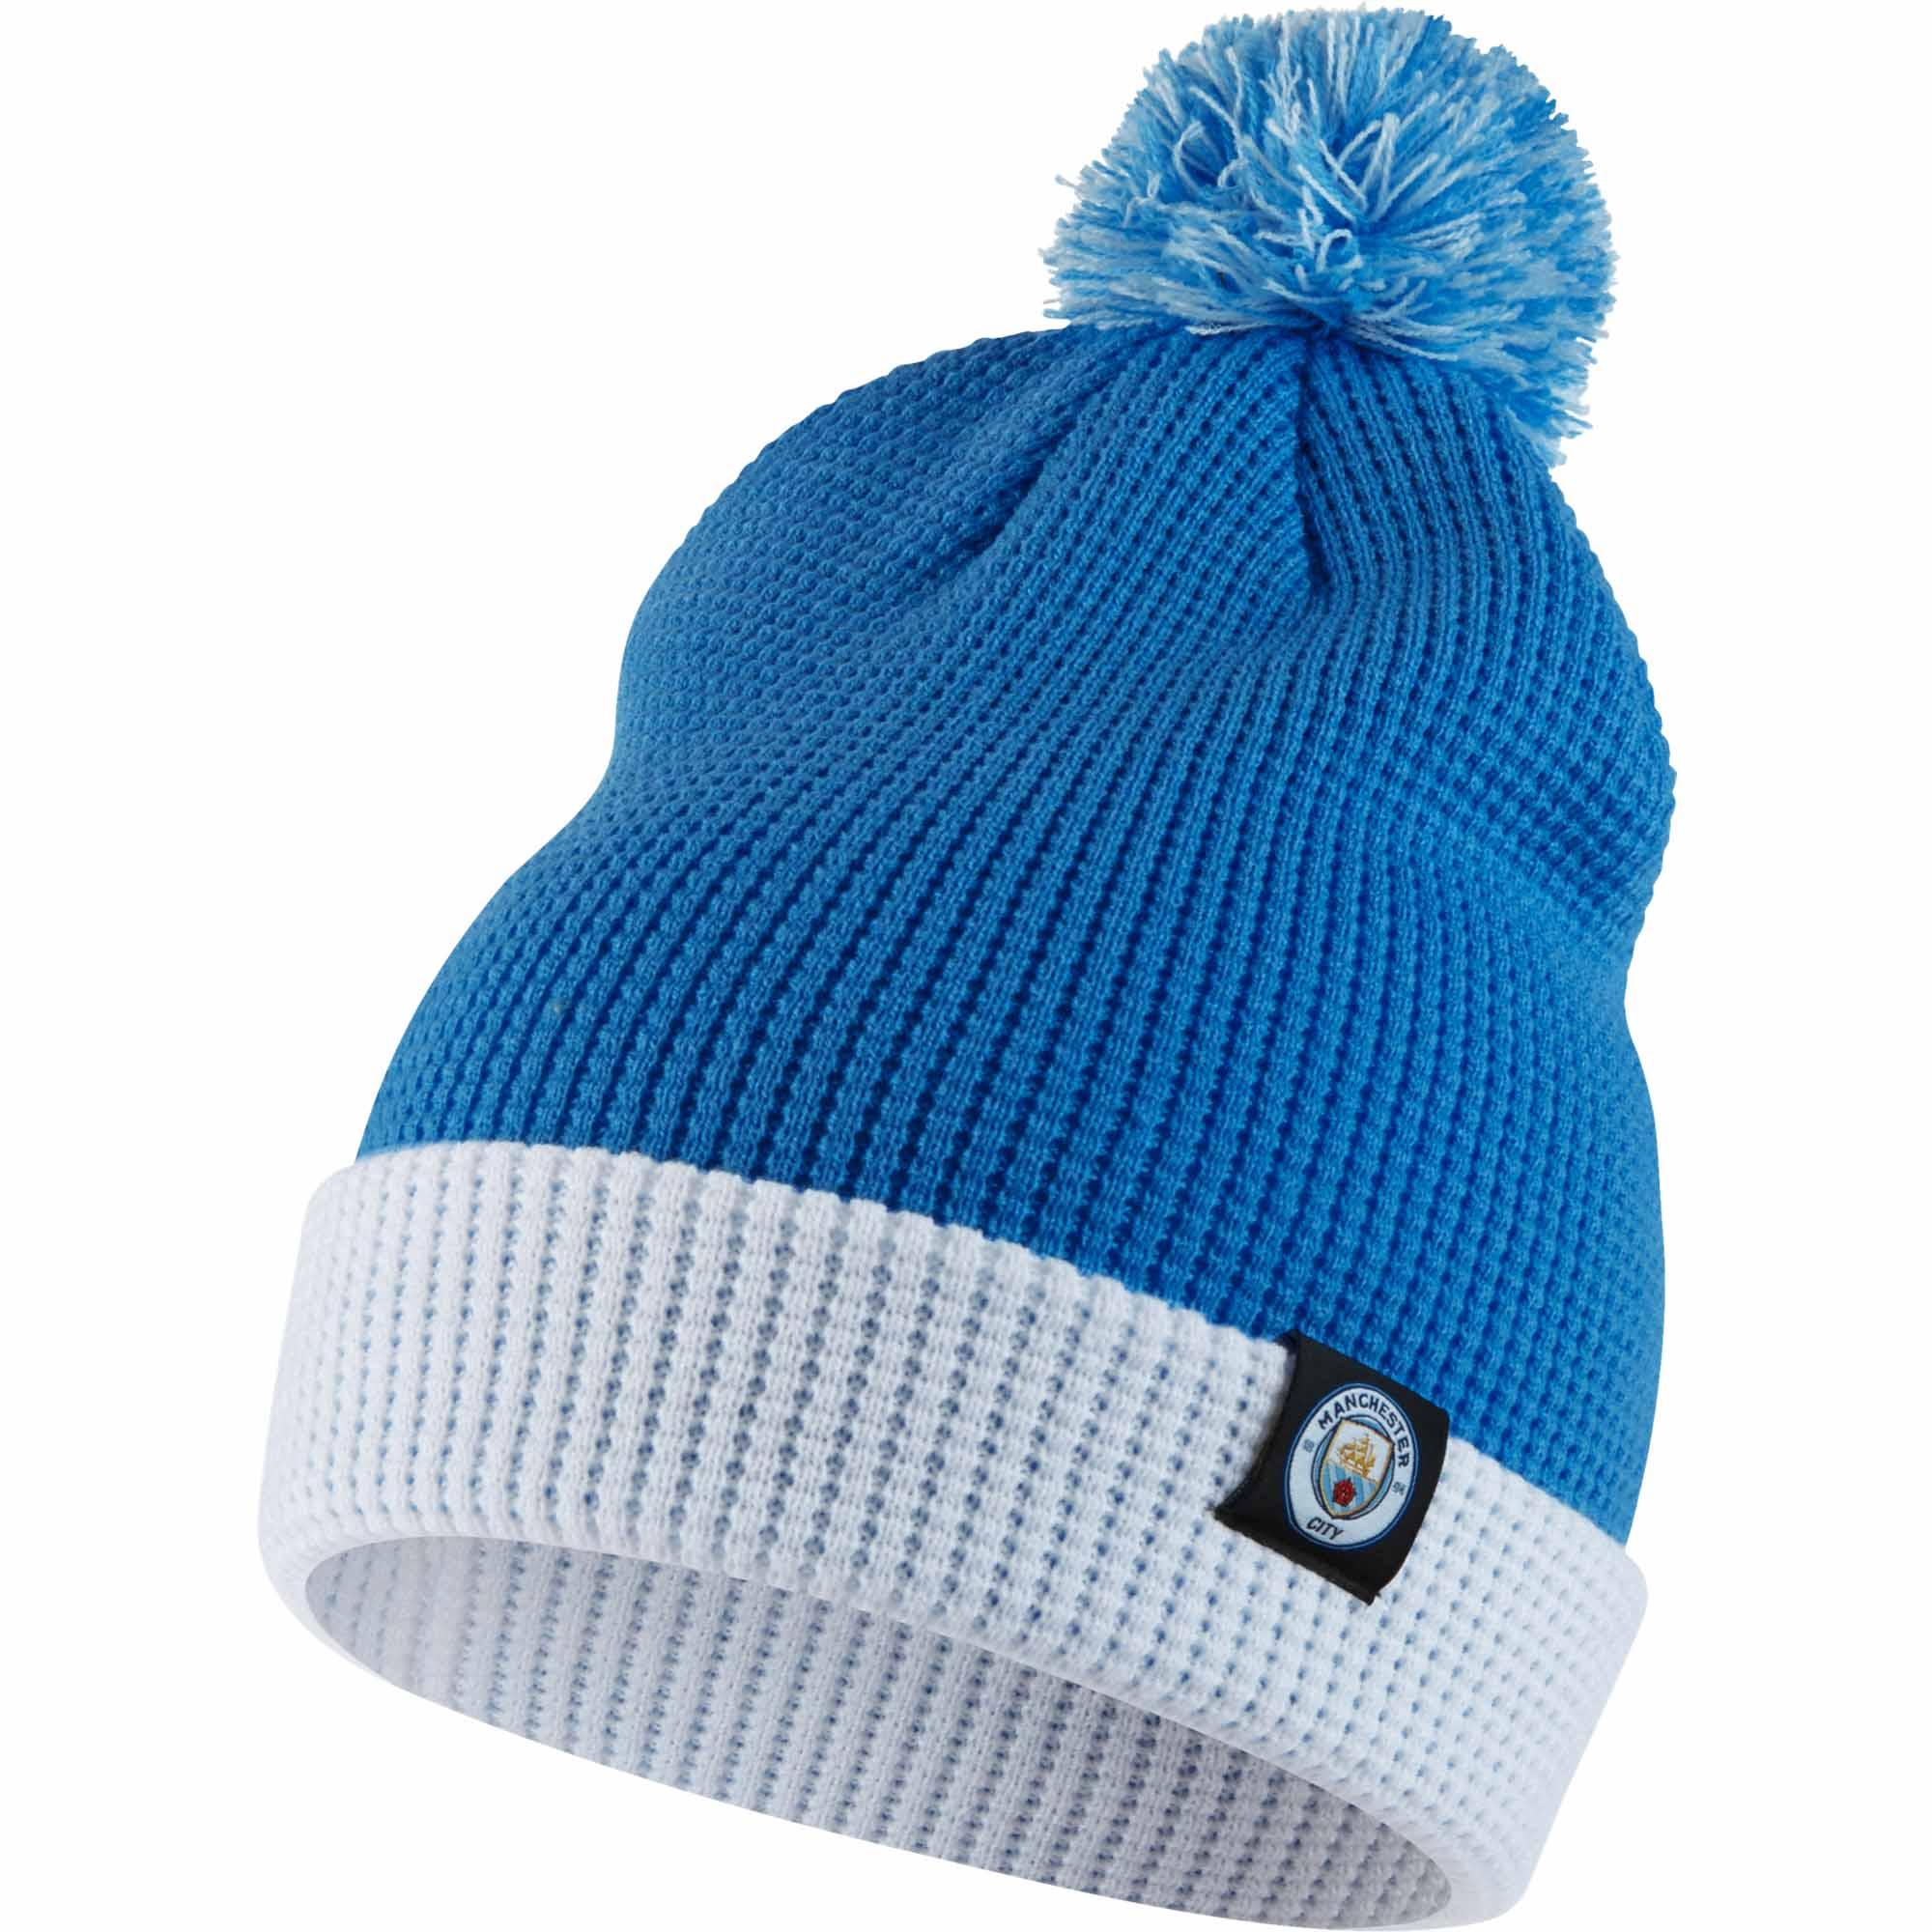 Nike Manchester City Beanie - Blue Nike Soccer Hats 23509cd97be